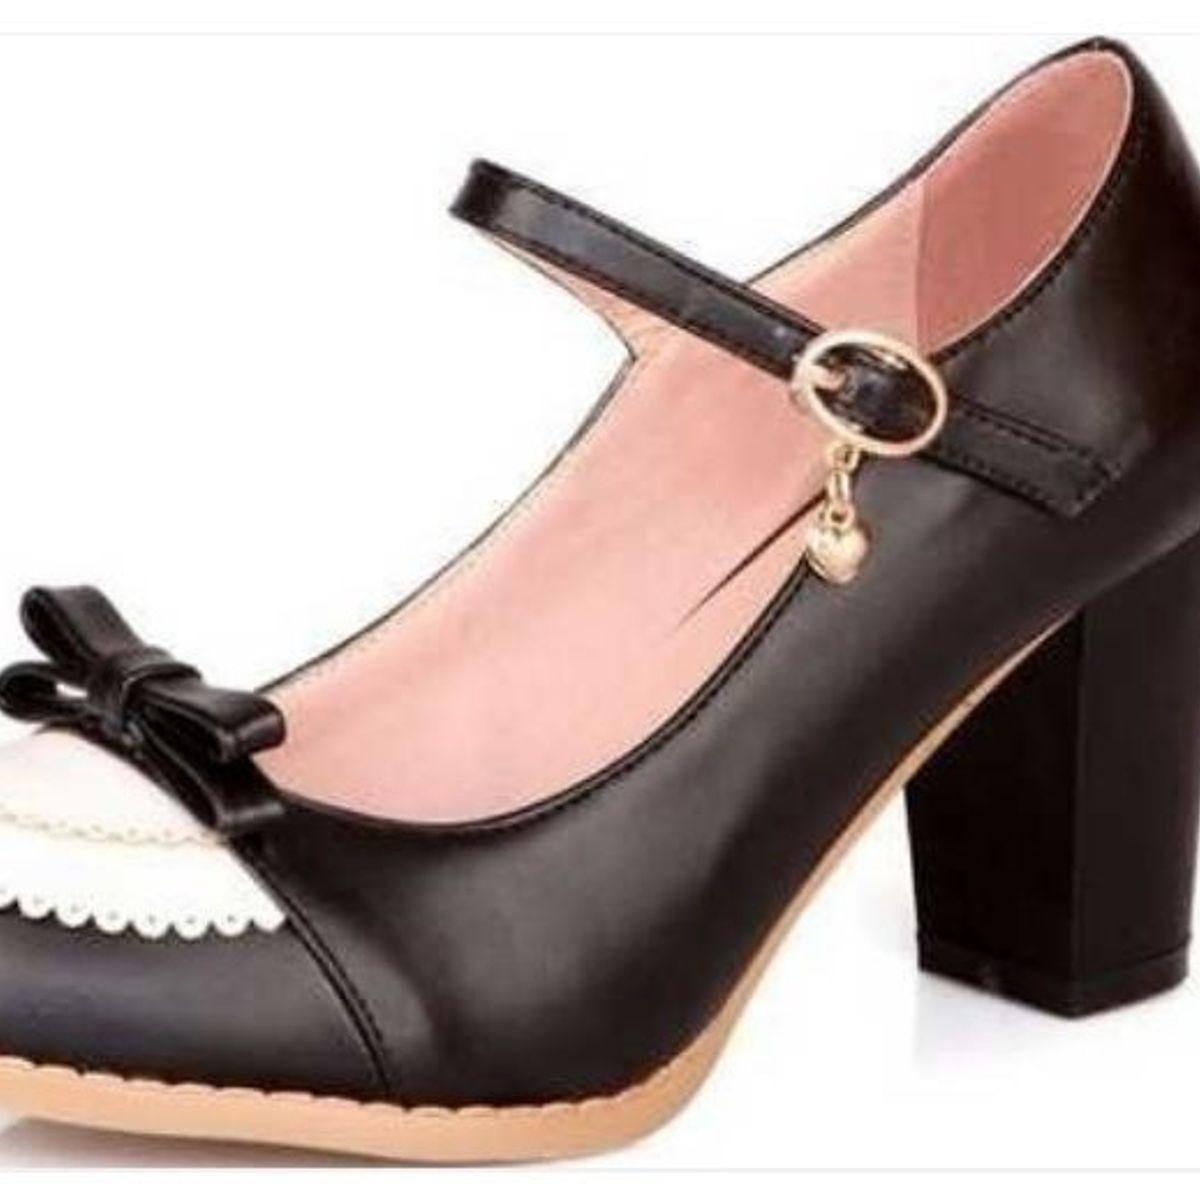 a0be82e1b2 Sapato Boneca Gótico/cosplay/lolita   Sapato Feminino Nunca Usado 31727140    enjoei